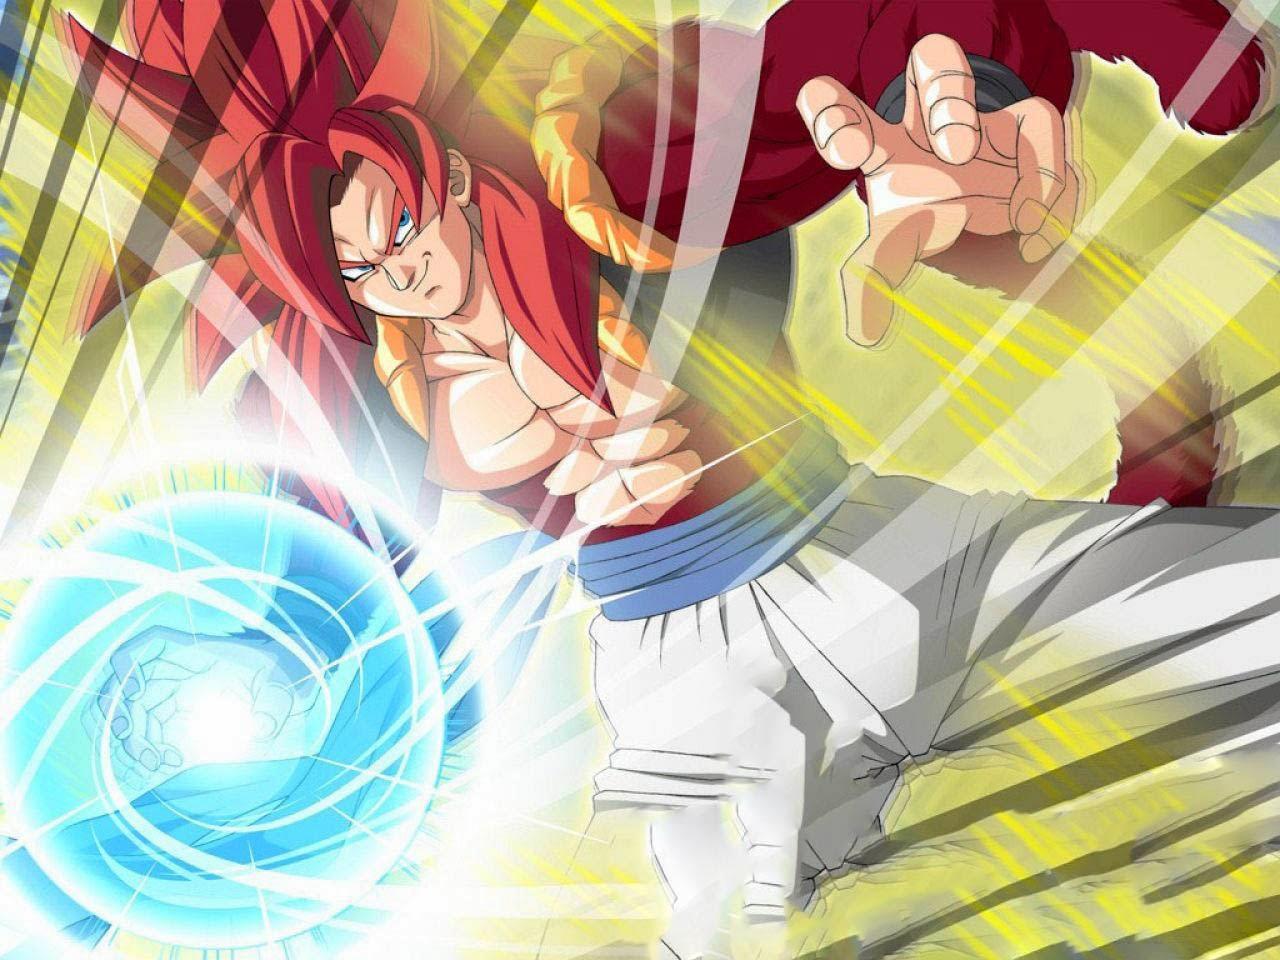 Goku Ssj Dios Para Fondo De Pantalla: Imagenes Hilandy: Fondo De Pantalla Dragon Ball Goku